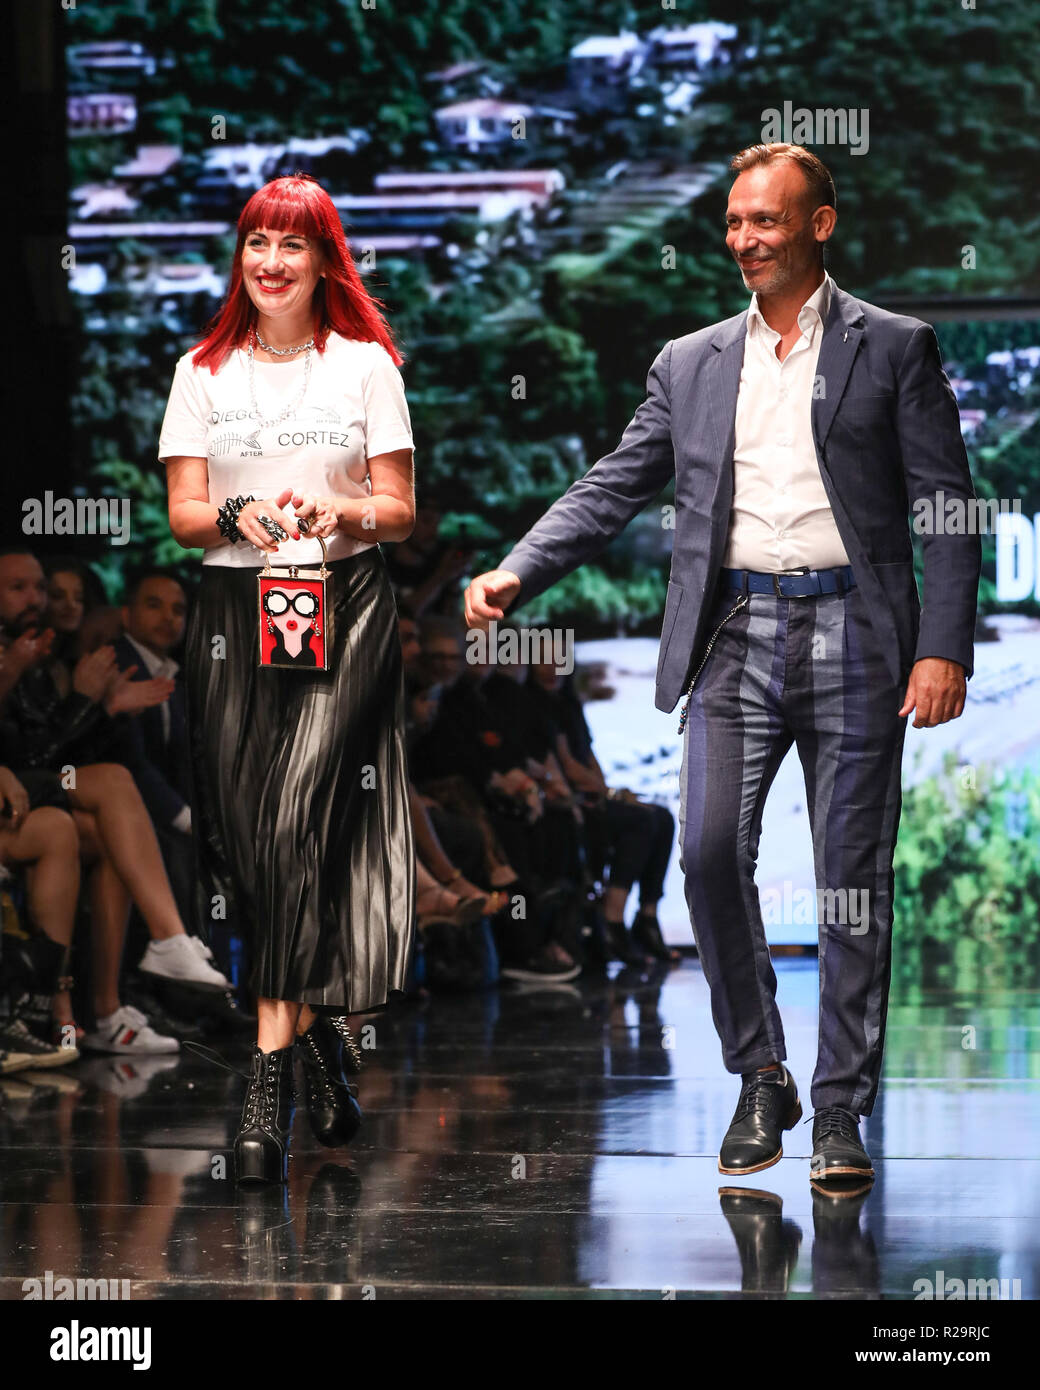 Los Angeles Fashion Week Art Hearts Fashion Diego Cortez Catwalk Featuring Angie Valentino Diego Cortez Fashion